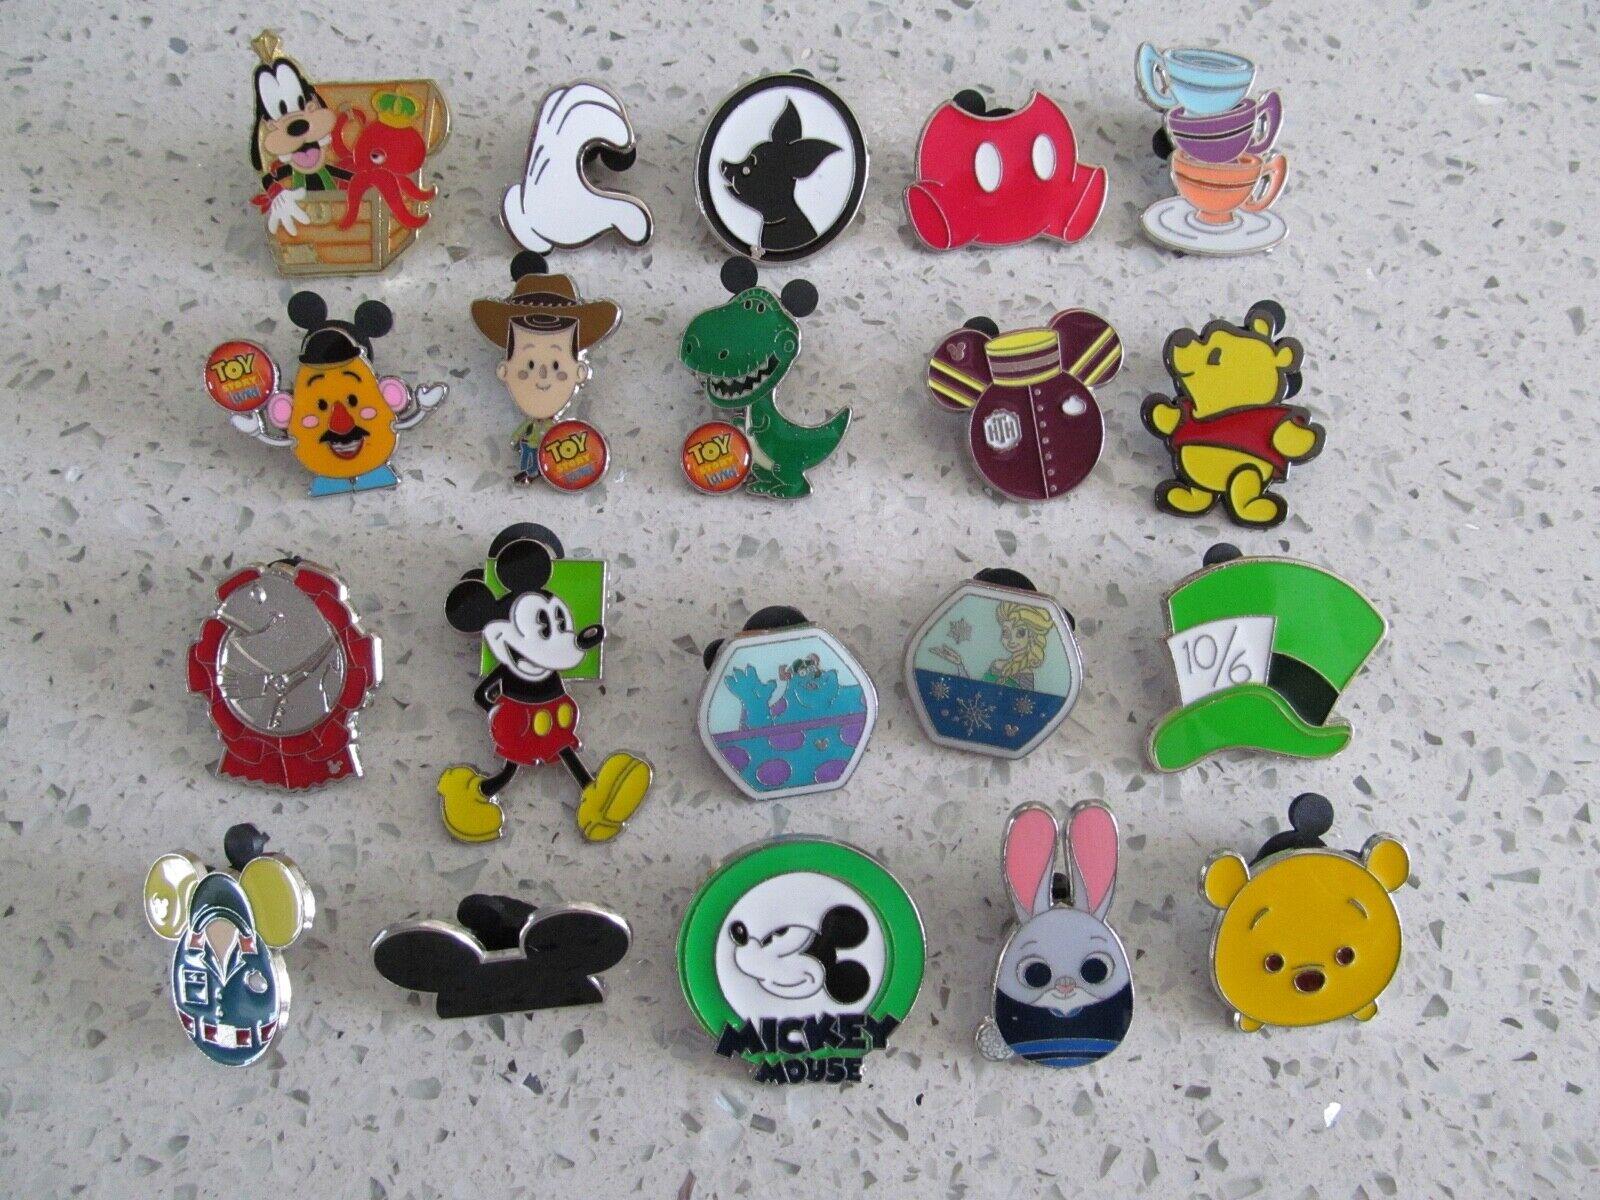 Disney Trader Pins Lot of 20 Disneyland Disney World Lanyard Pins